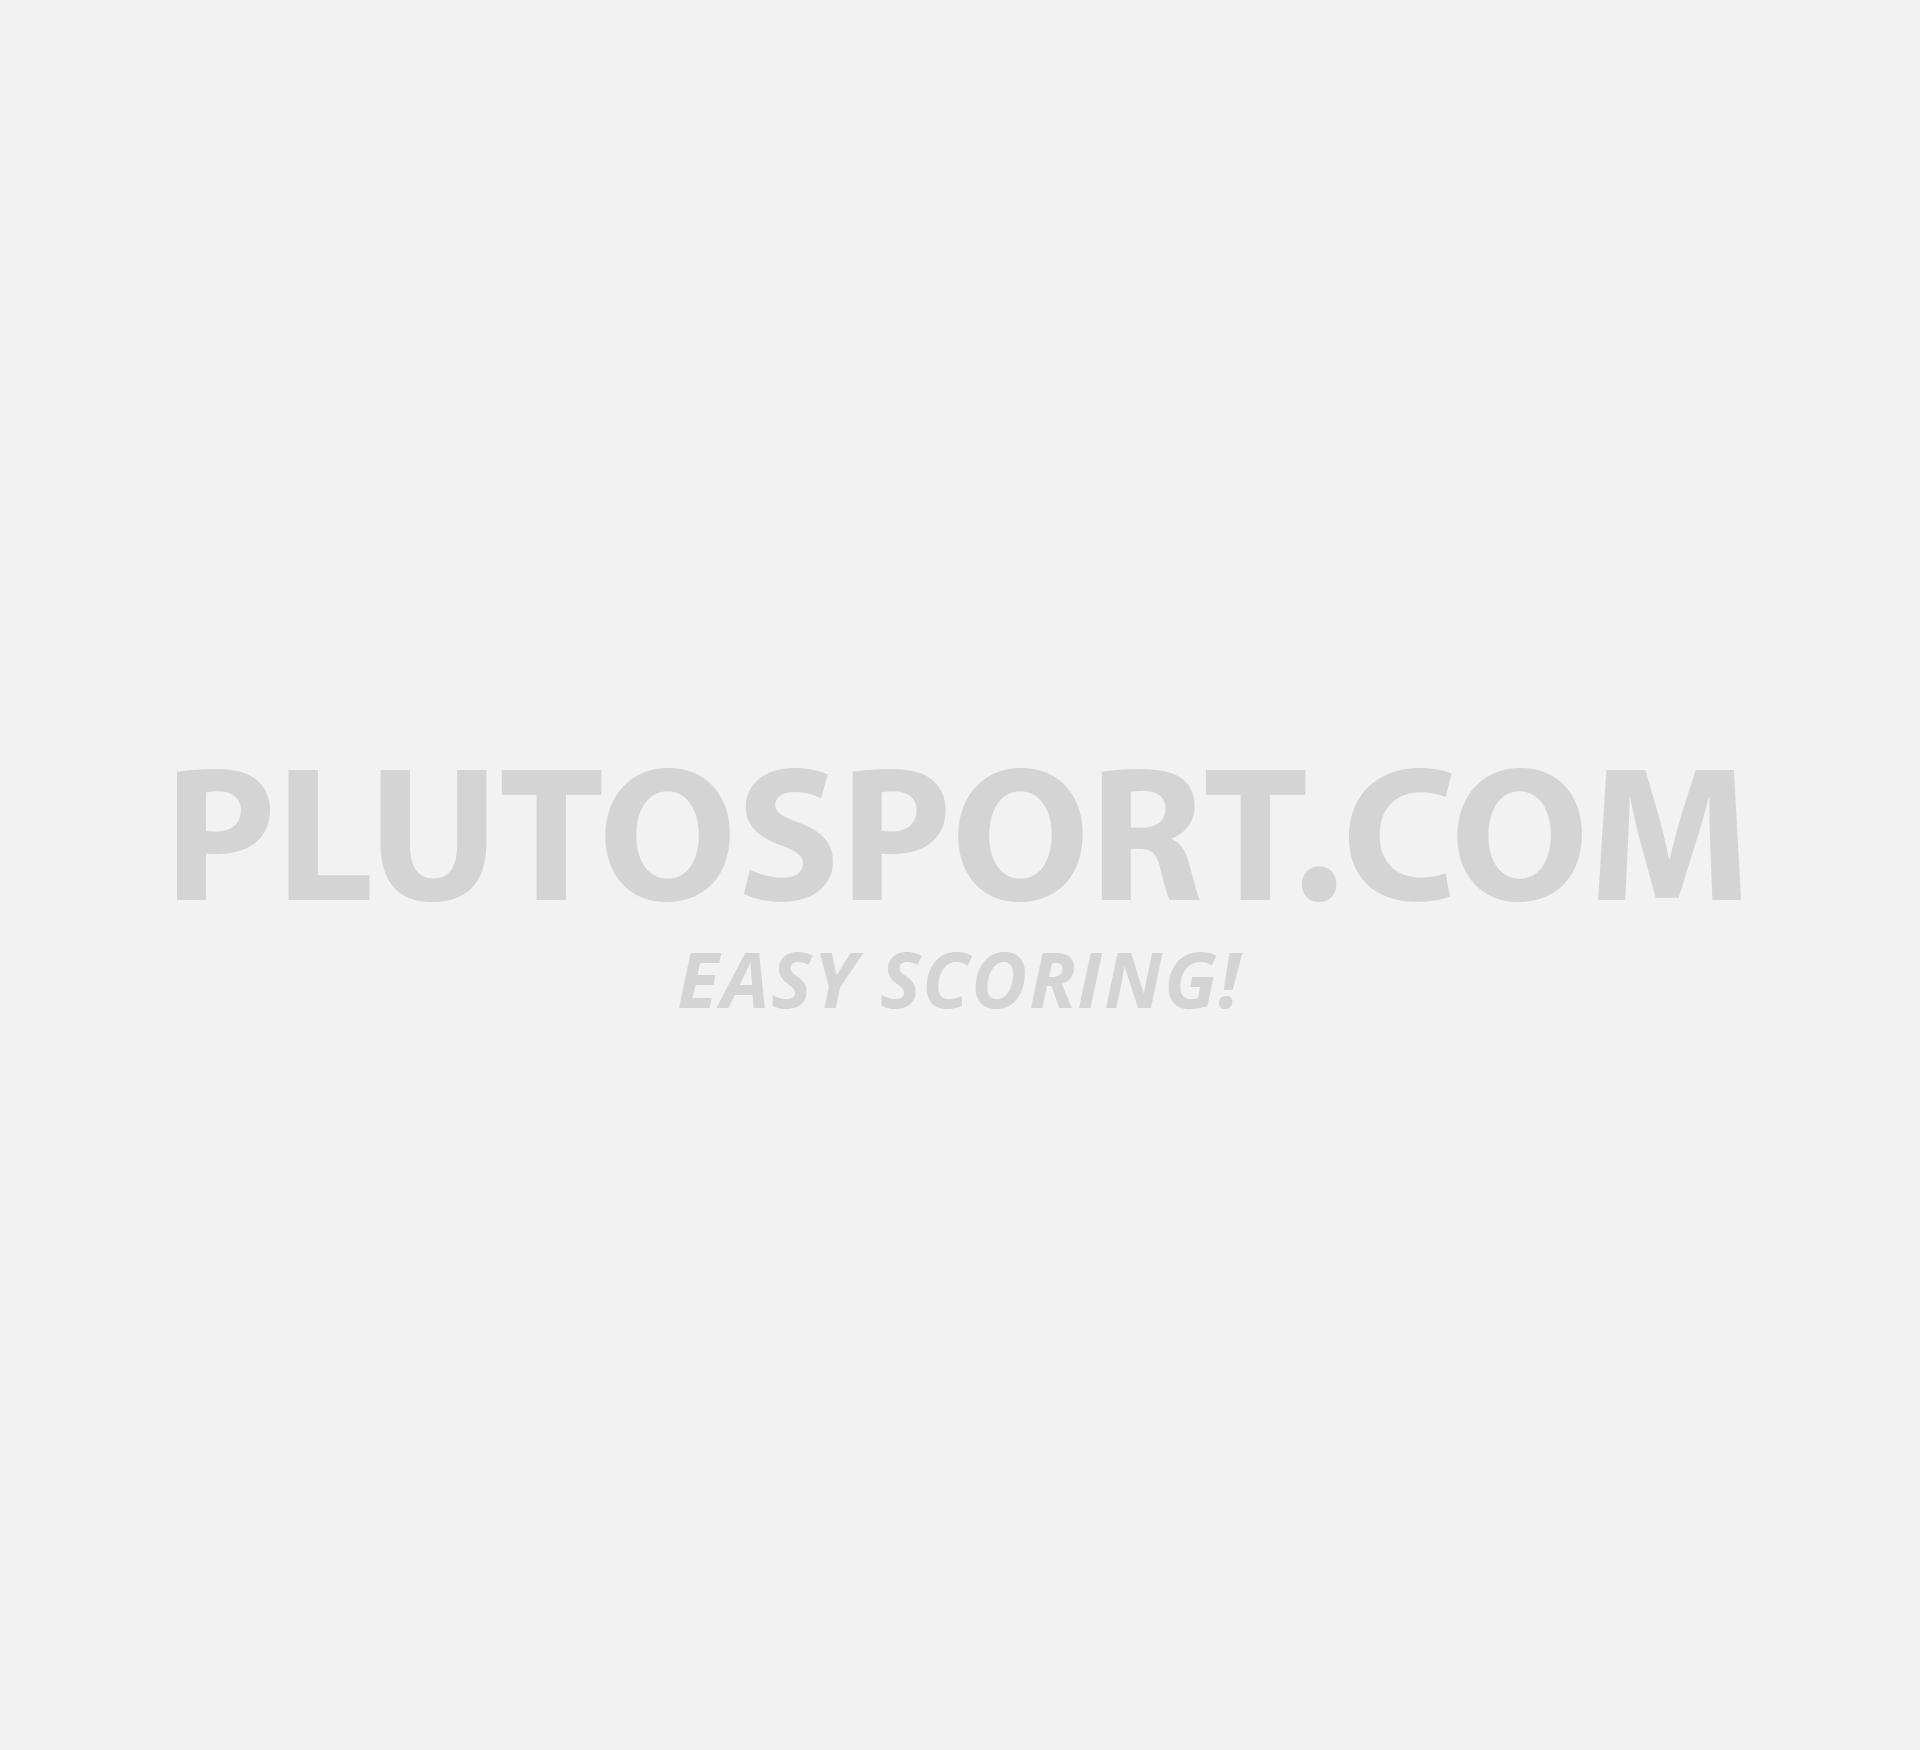 cbc561ecf3fc Puma Future Cat M1 SF Catch Sneakers Men - Sneakers - Shoes - Lifestyle -  Sports